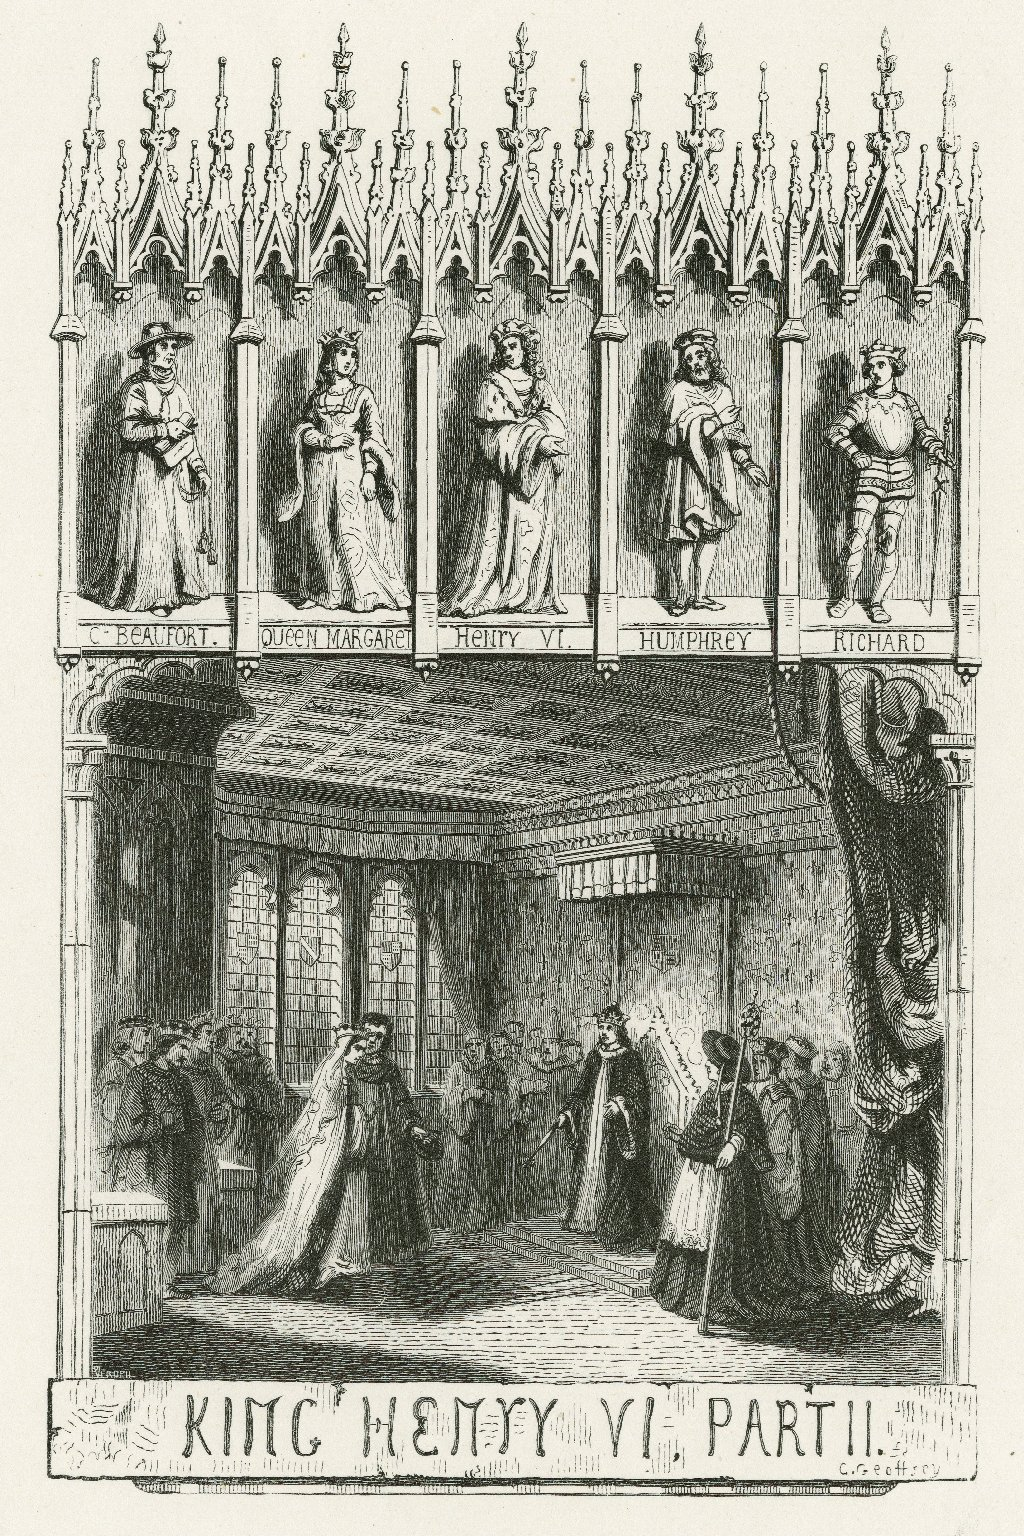 King Henry VI, part II ... [act I, scene 1] [graphic] / Verdeil ; C. Geoffroy.